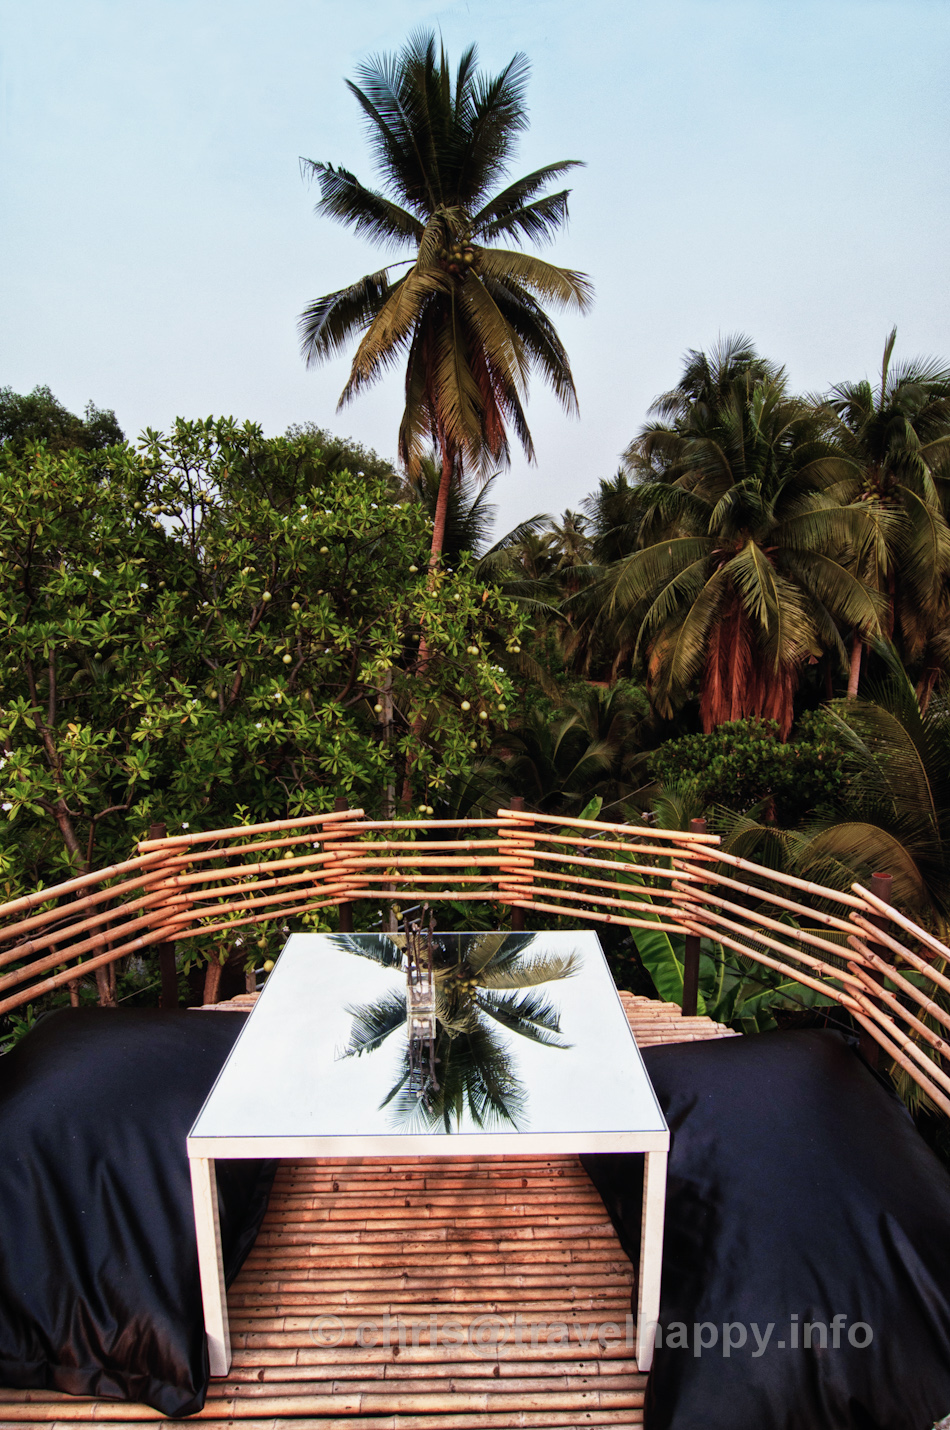 Tabletop Over The Treetops, Bangkok Tree House Hotel